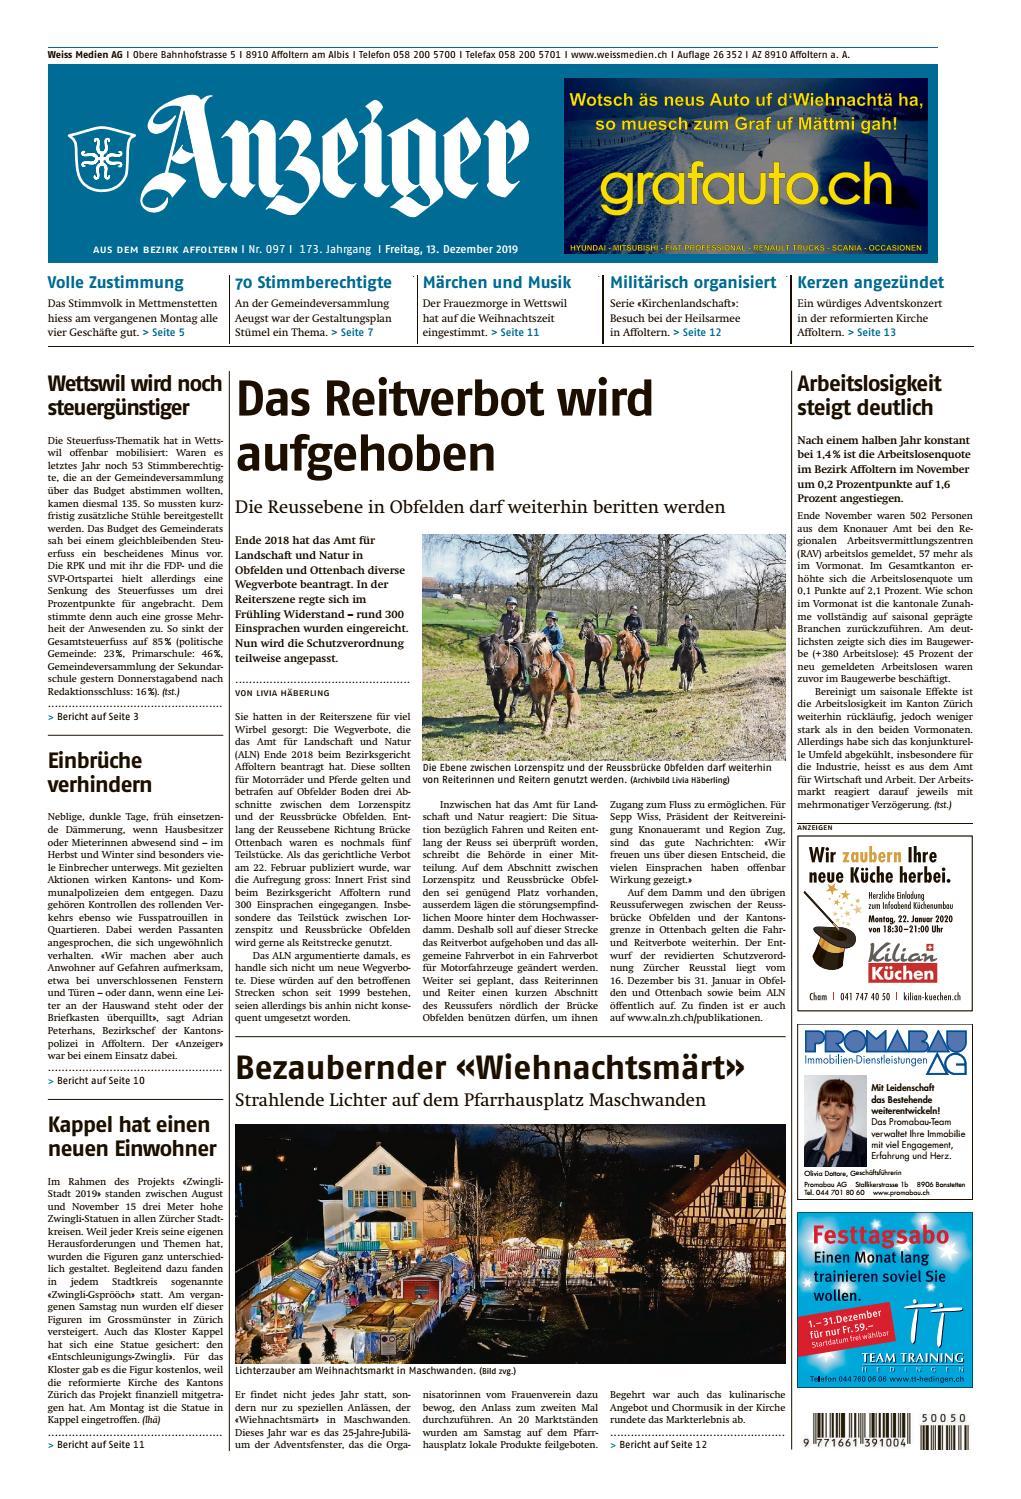 Single Frauen Zizers Moosseedorf Bekanntschaft Hirzenbach